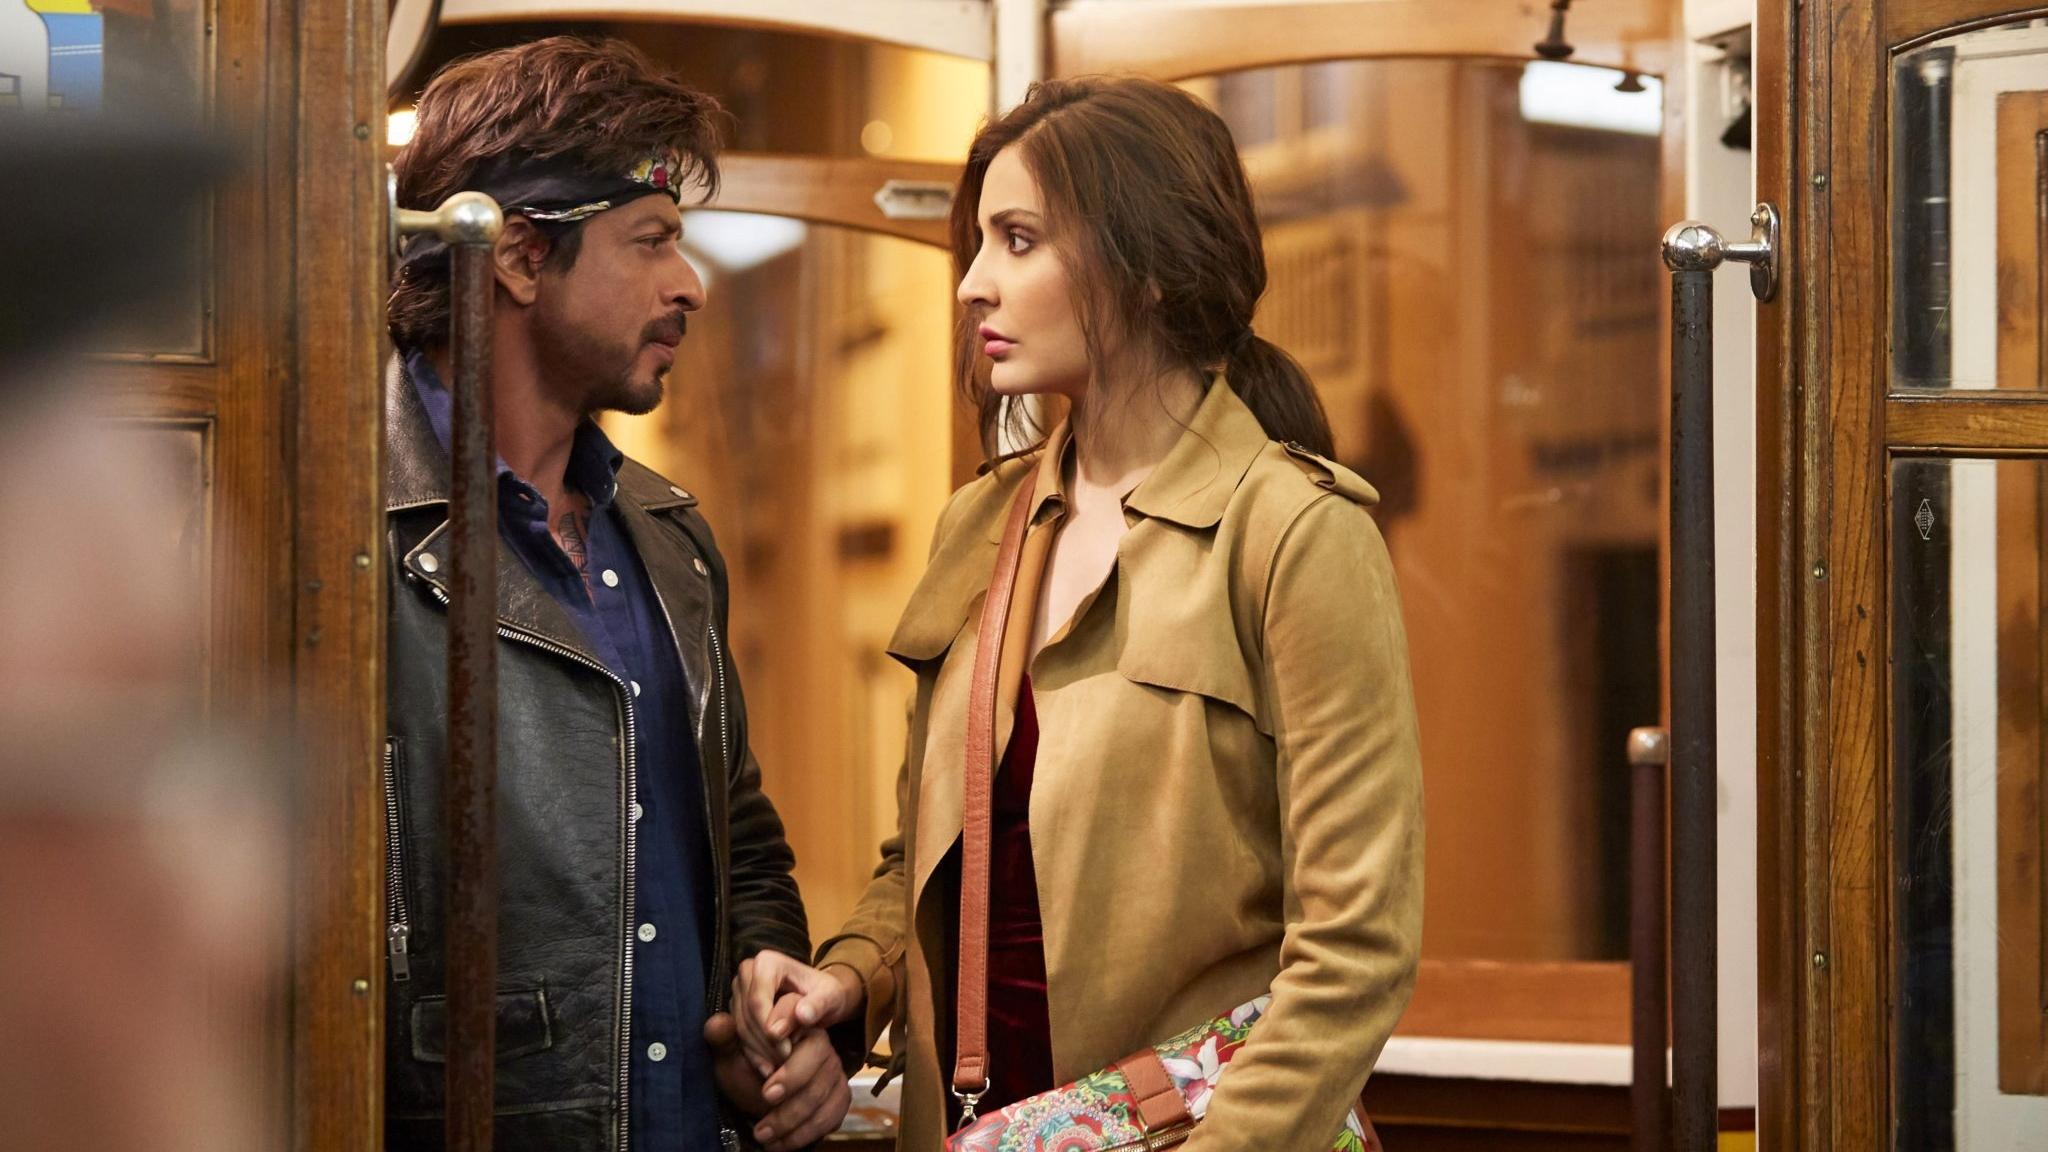 SRK-Anushka-Jab-Harry-Met-Sejal-4K-5K.jpg